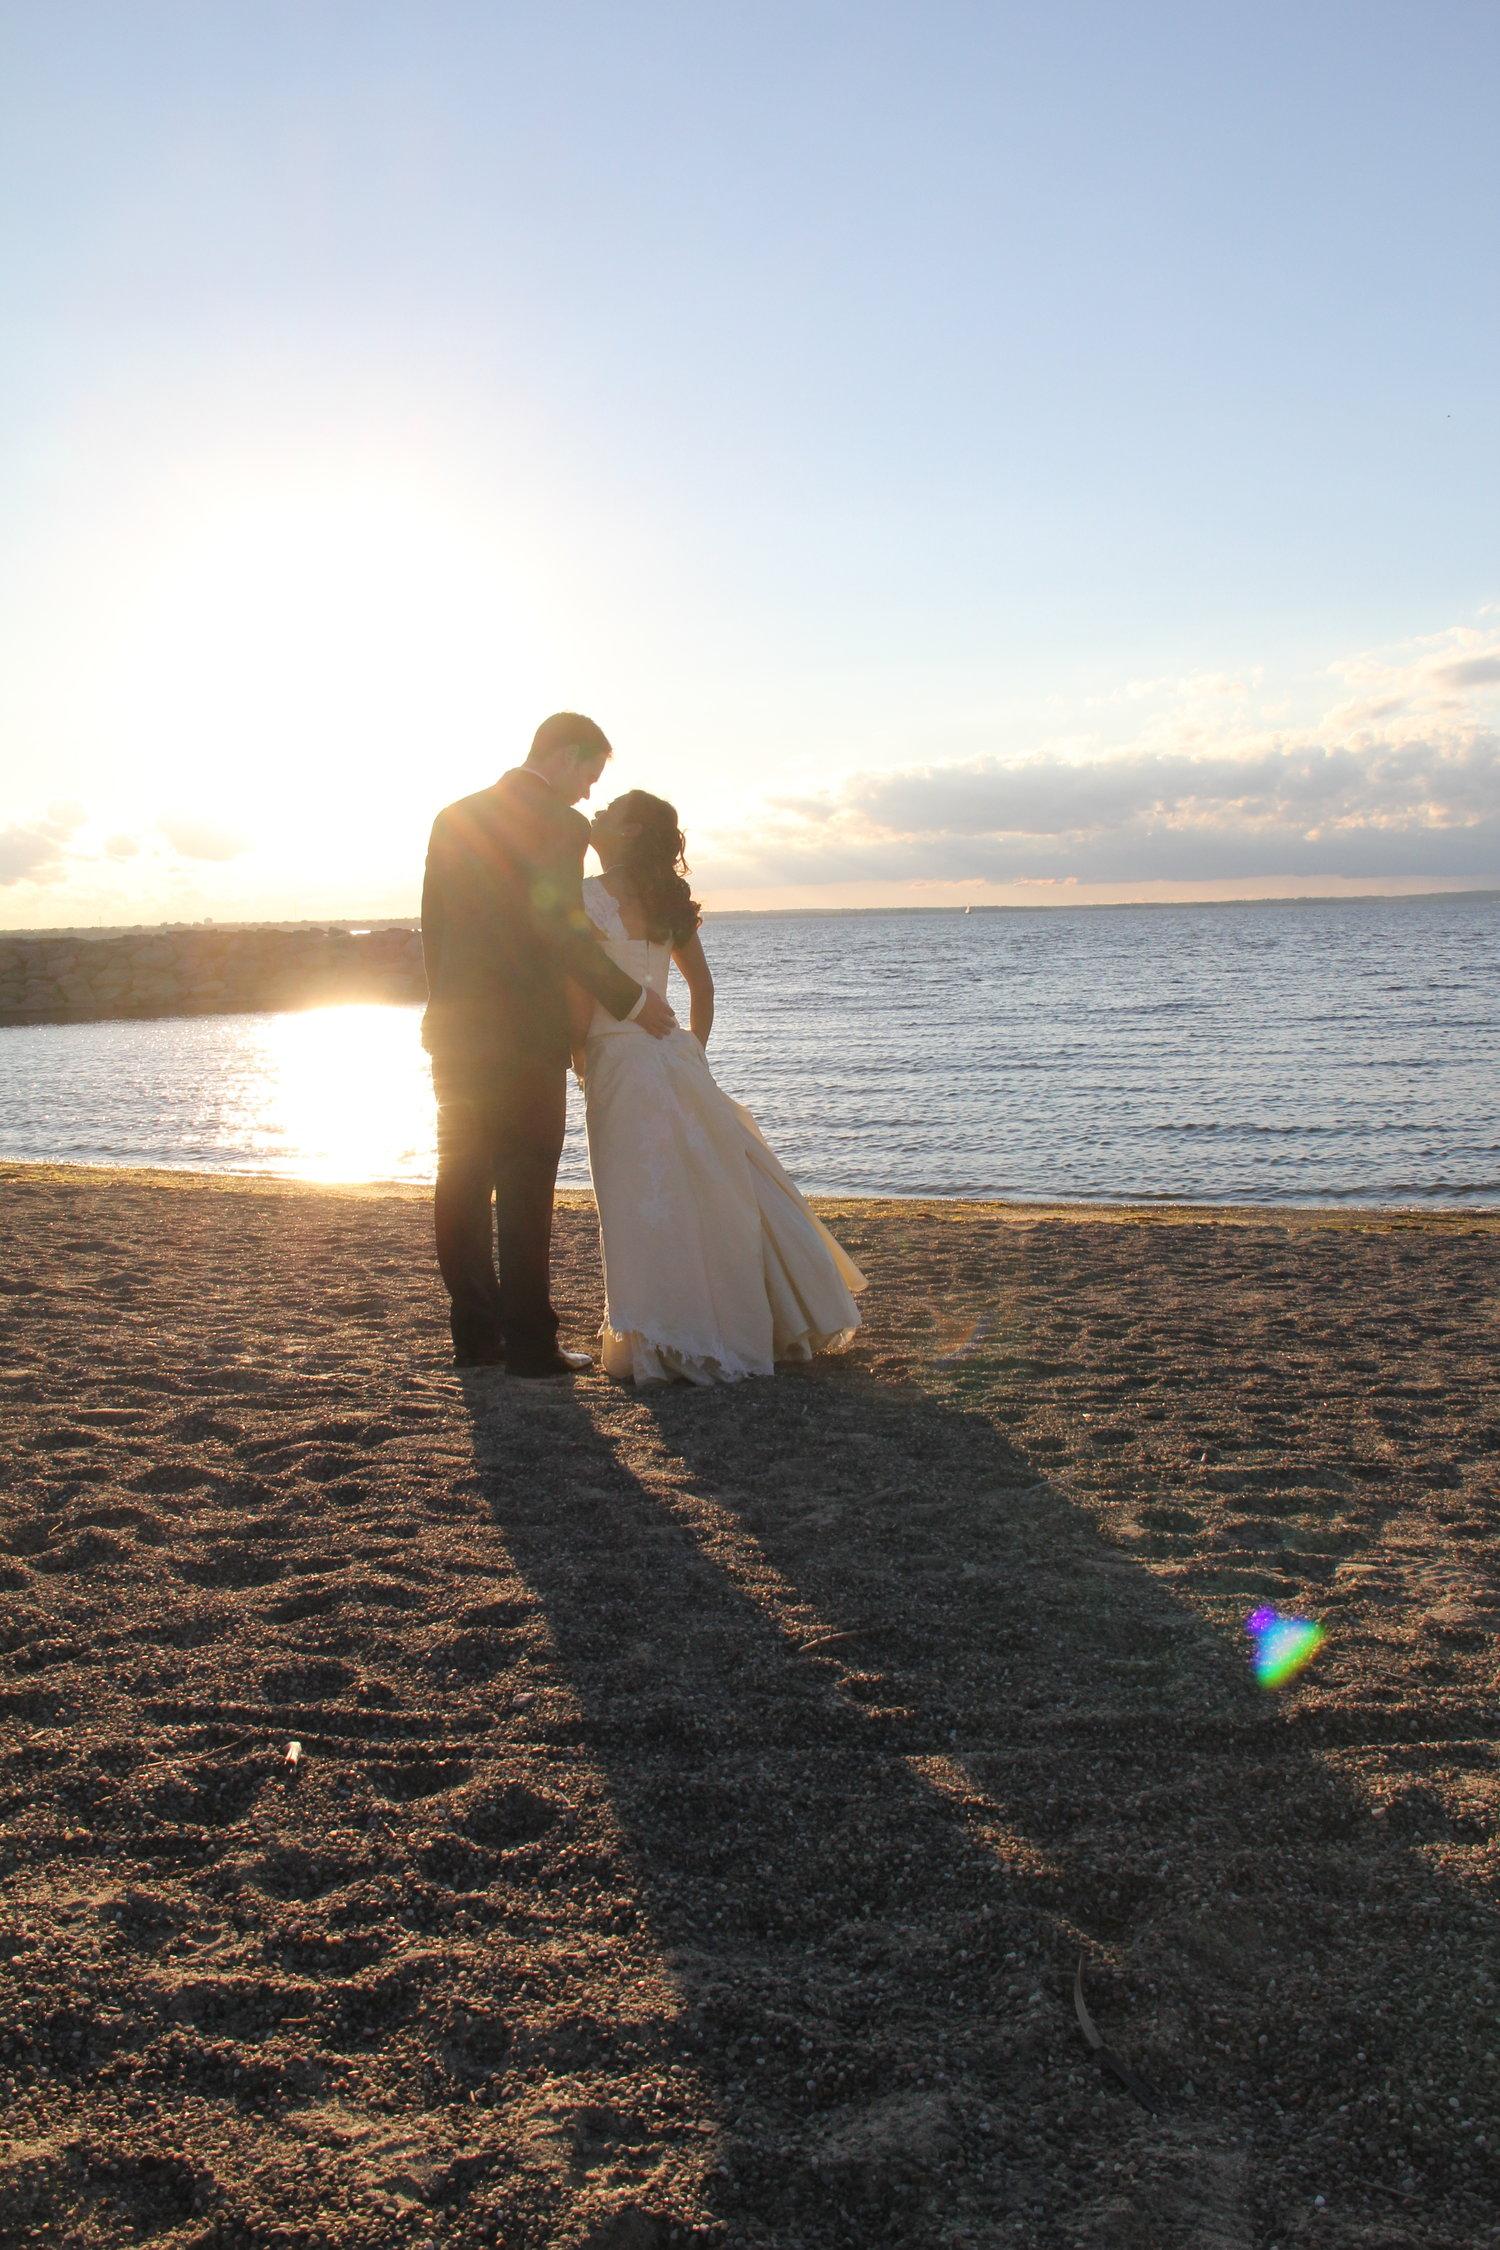 Gloria+and+Rob+Weddings+Beyond+Words+Dream+Love+Grow+Britannia+Beach.jpg